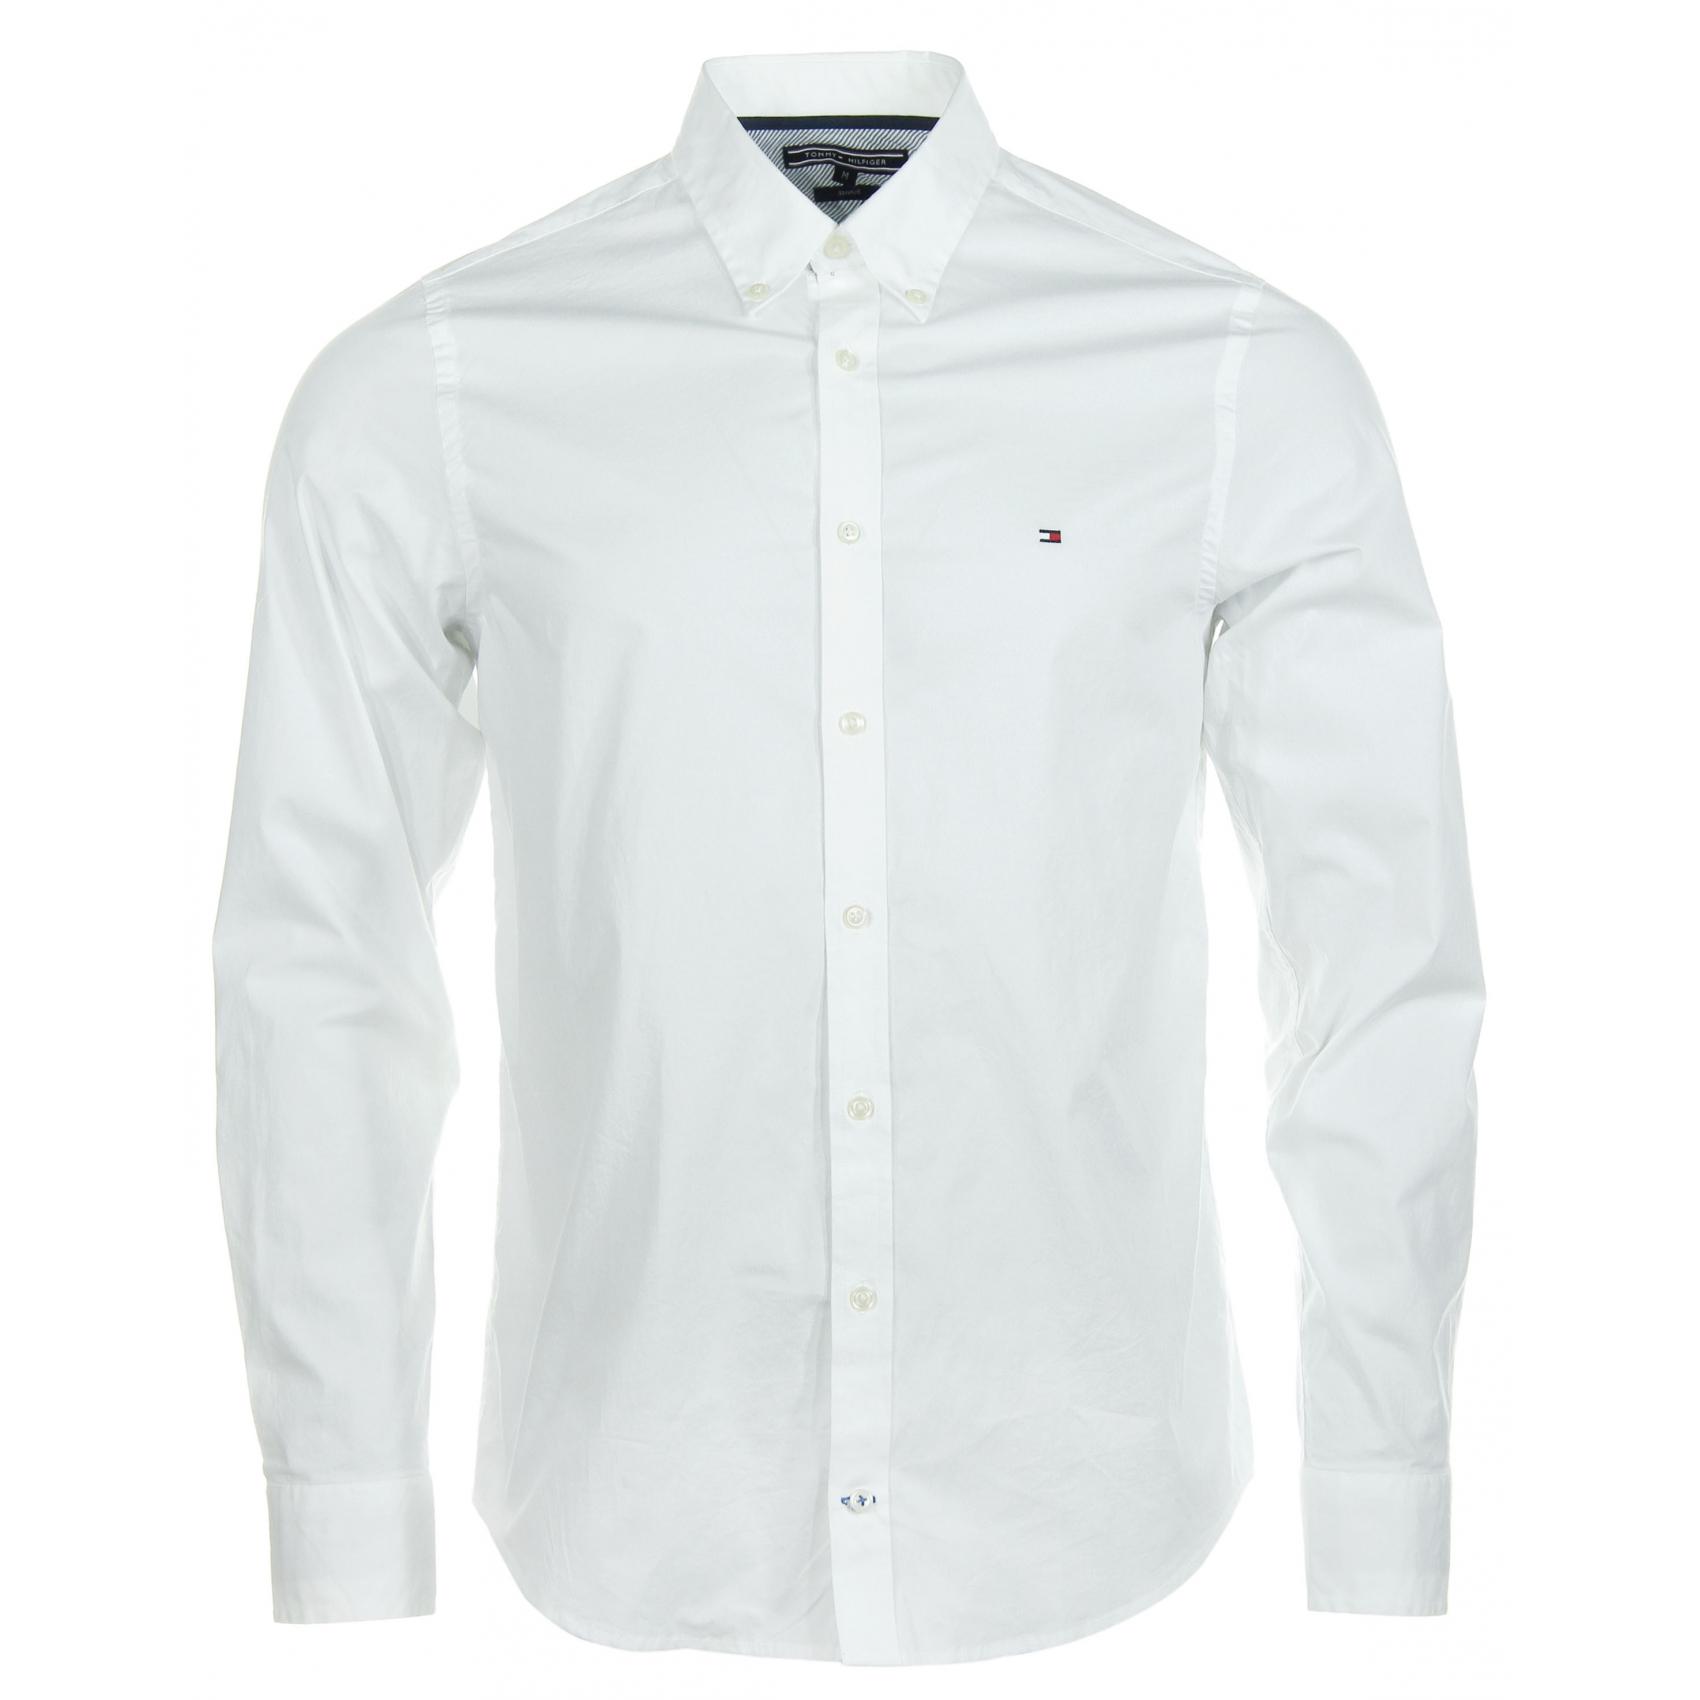 c28abd453 Koszula męska Tommy Hilfiger-Biała-r.L<sklep - 7093537421 ...